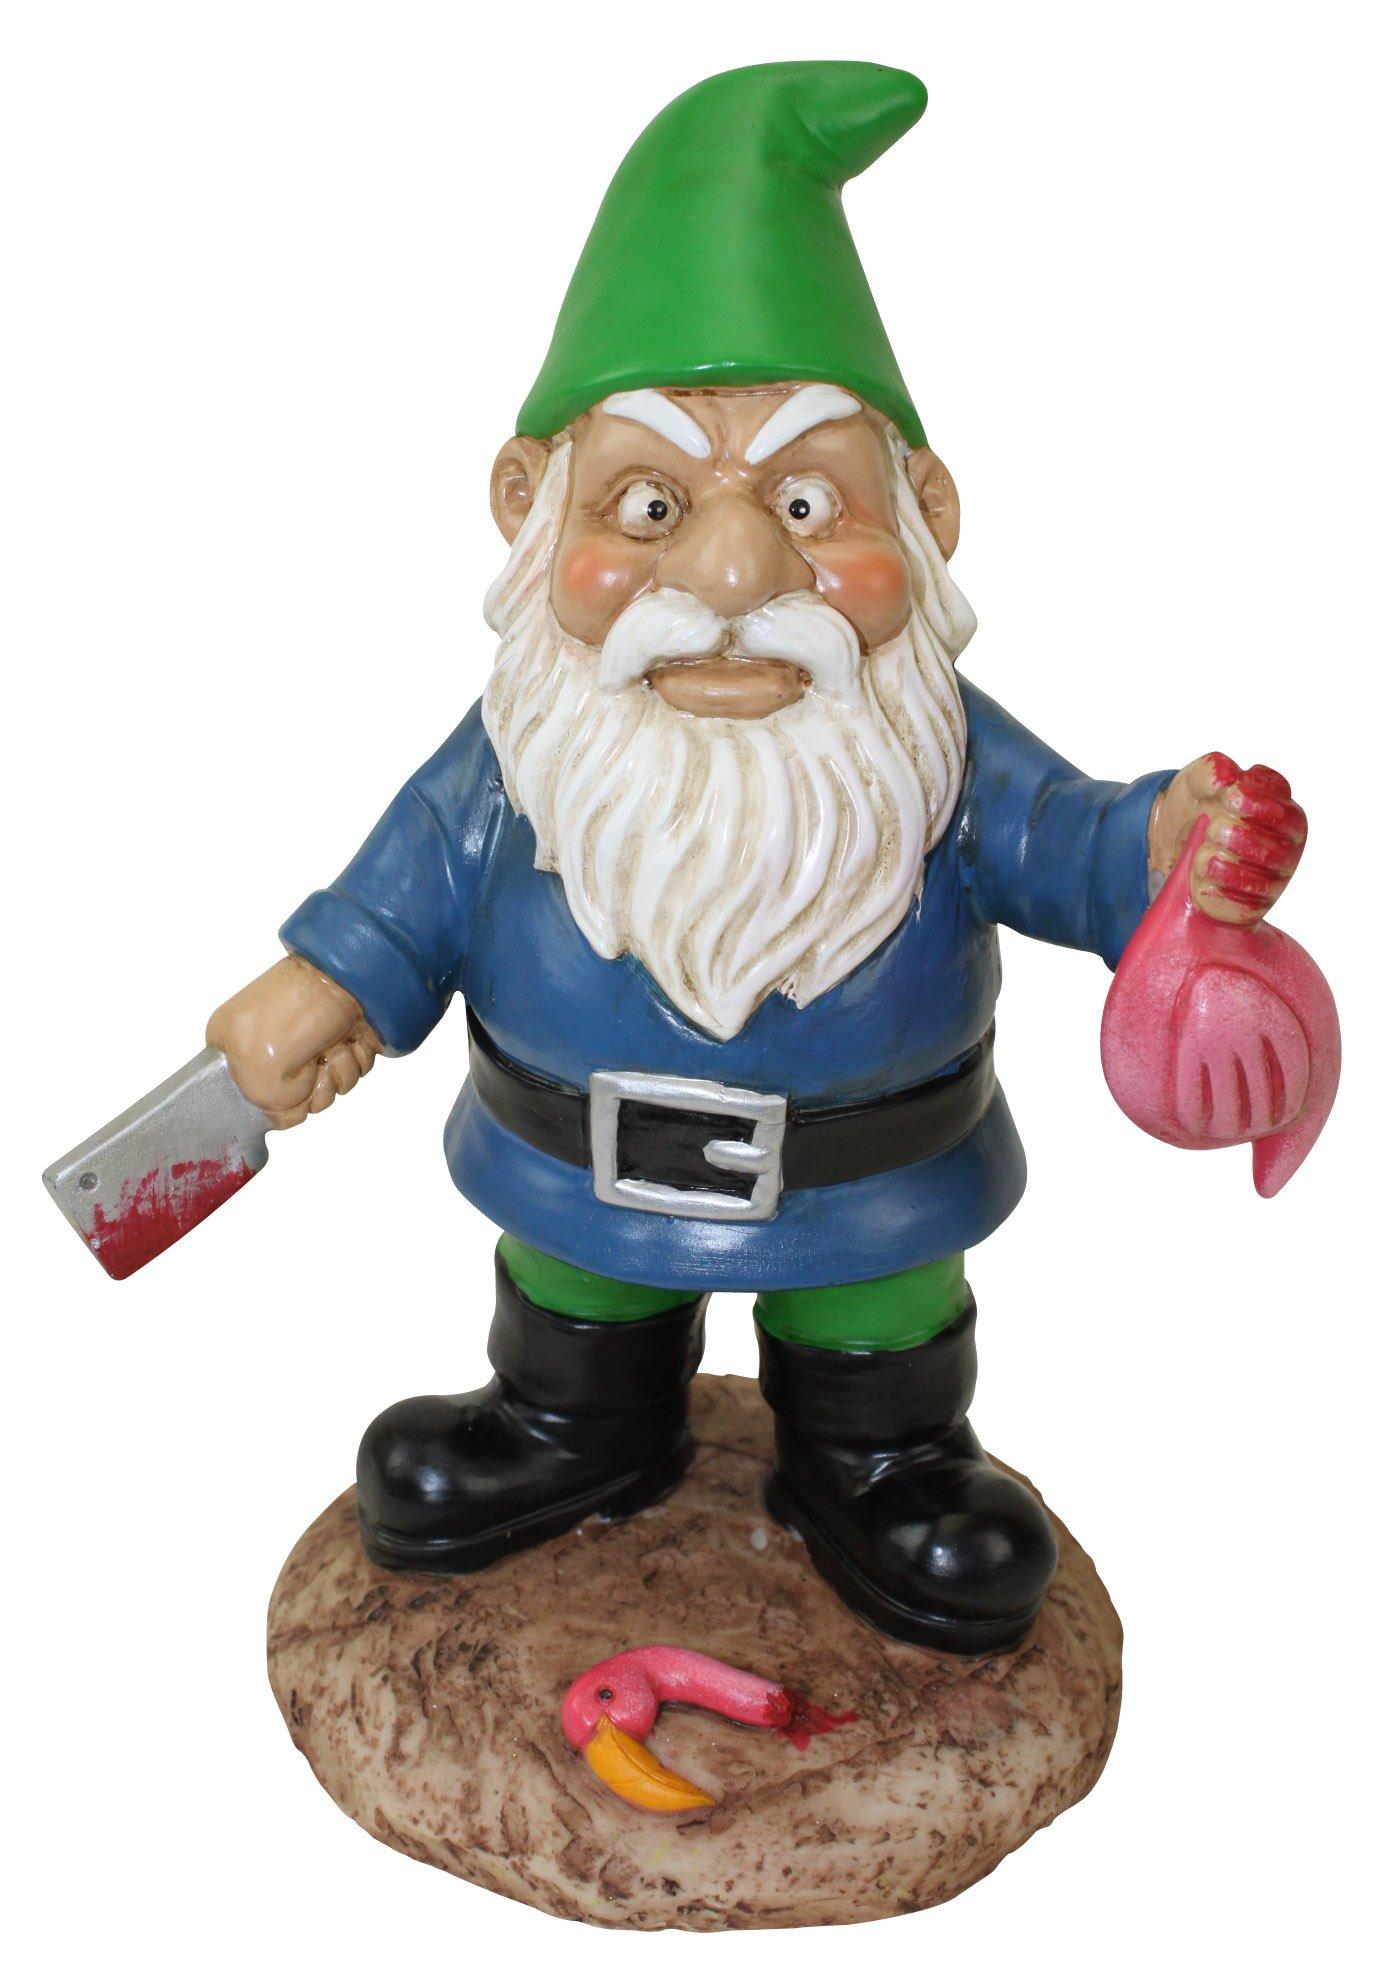 Gnome In Garden: Funny Garden Gnomes: Amazon.com